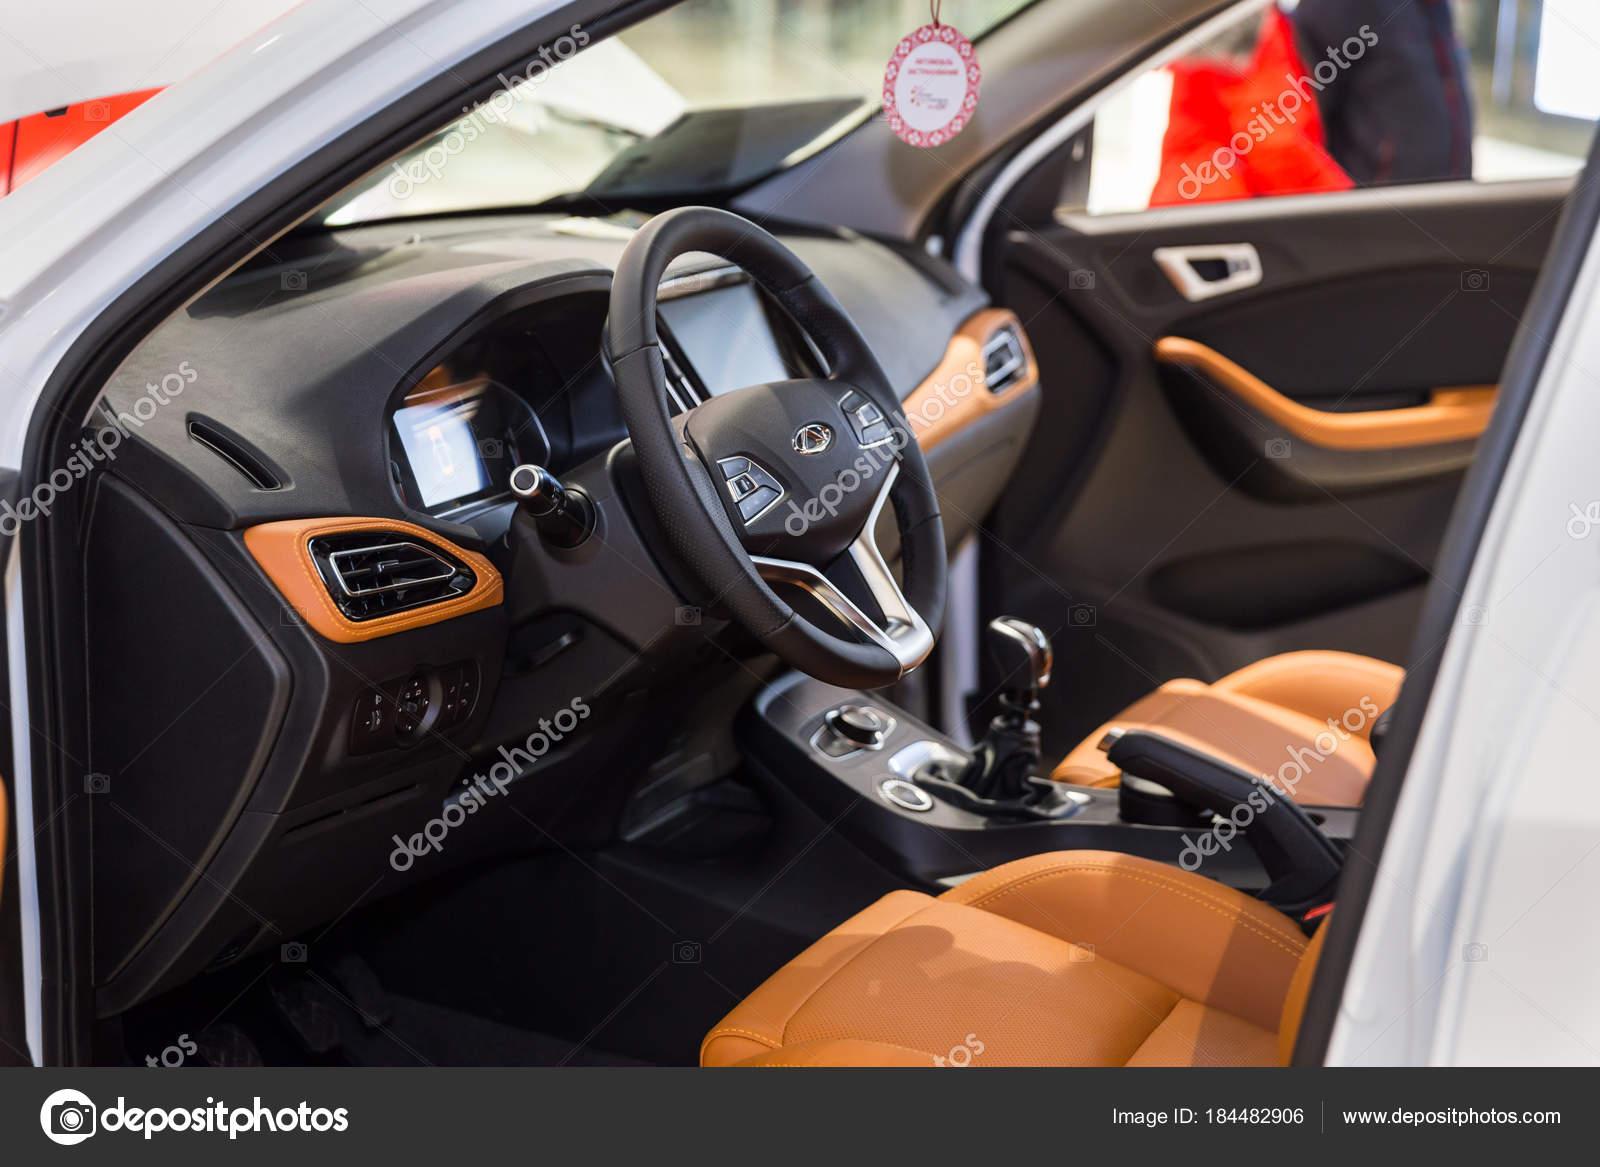 vinnitsa ukraine february 10 2018 white chery tiggo 7 concept car interior stock. Black Bedroom Furniture Sets. Home Design Ideas